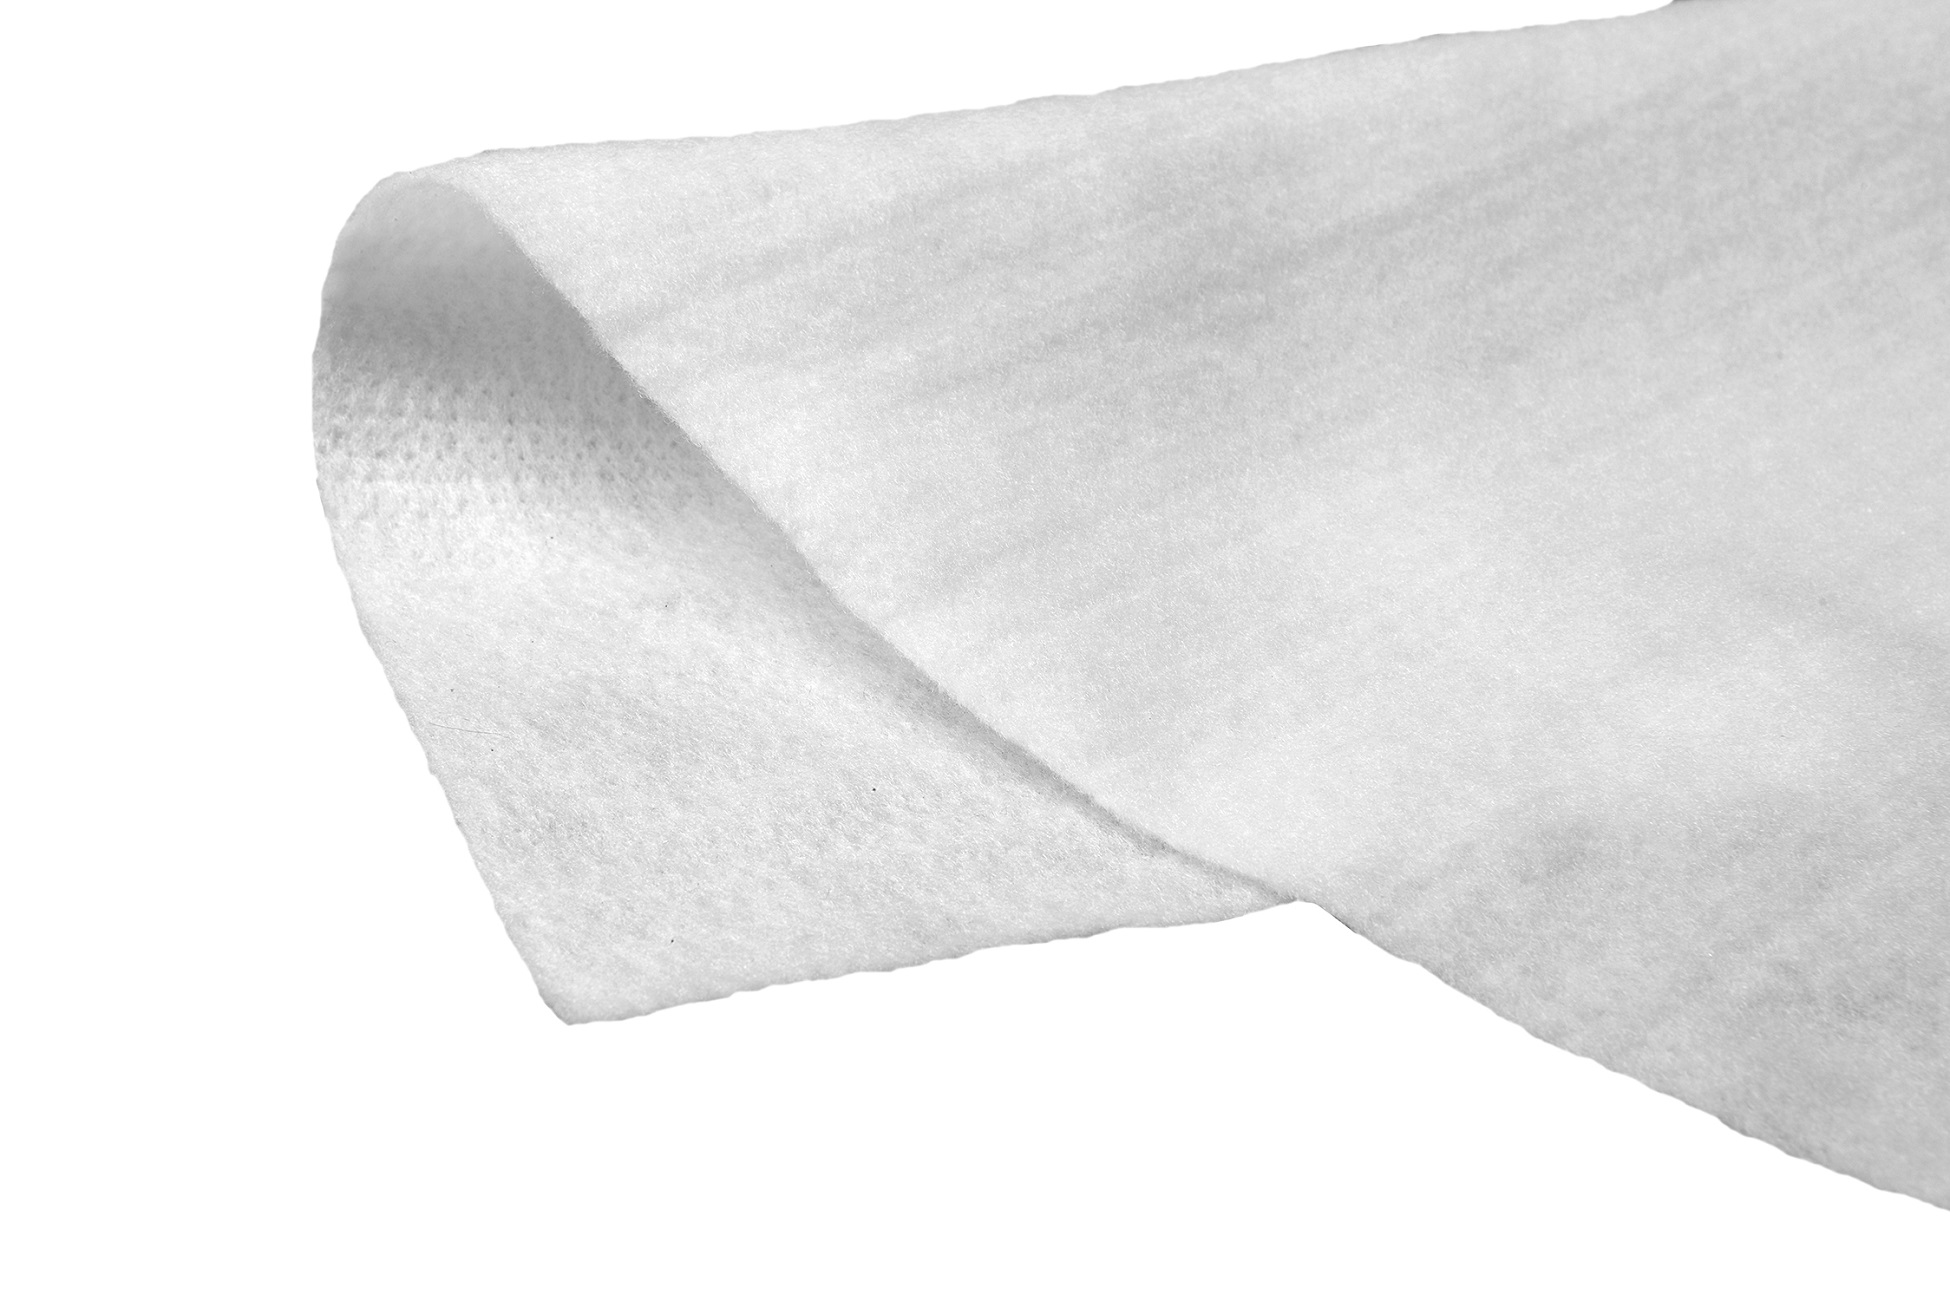 KOMA Tukový filtr do digestoře - 60 cm x 50 cm